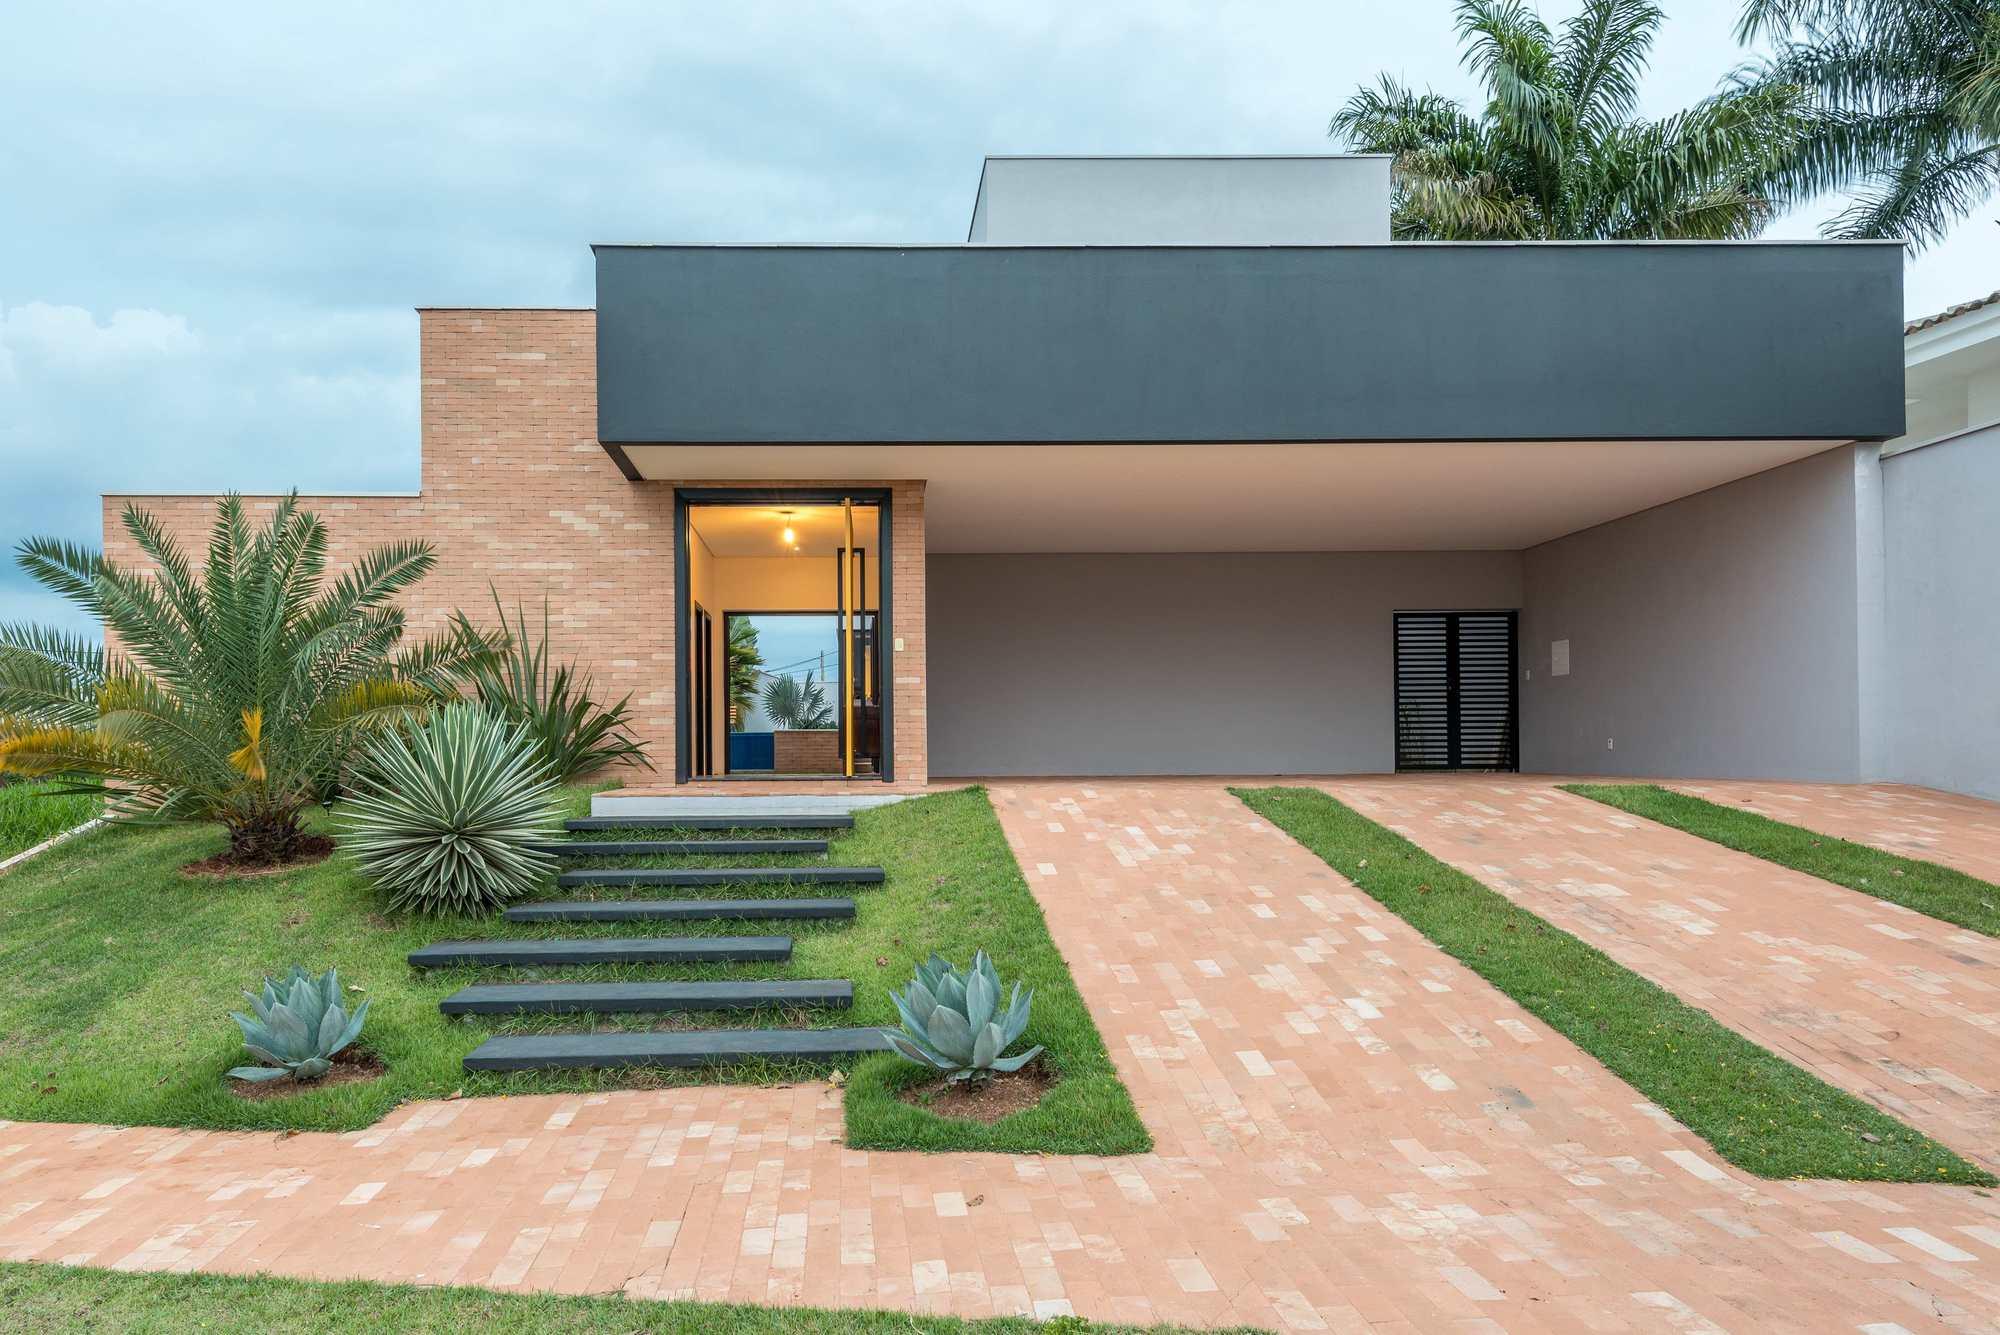 Casa CB  Laje 54 Arquitetura  ArchDaily Brasil